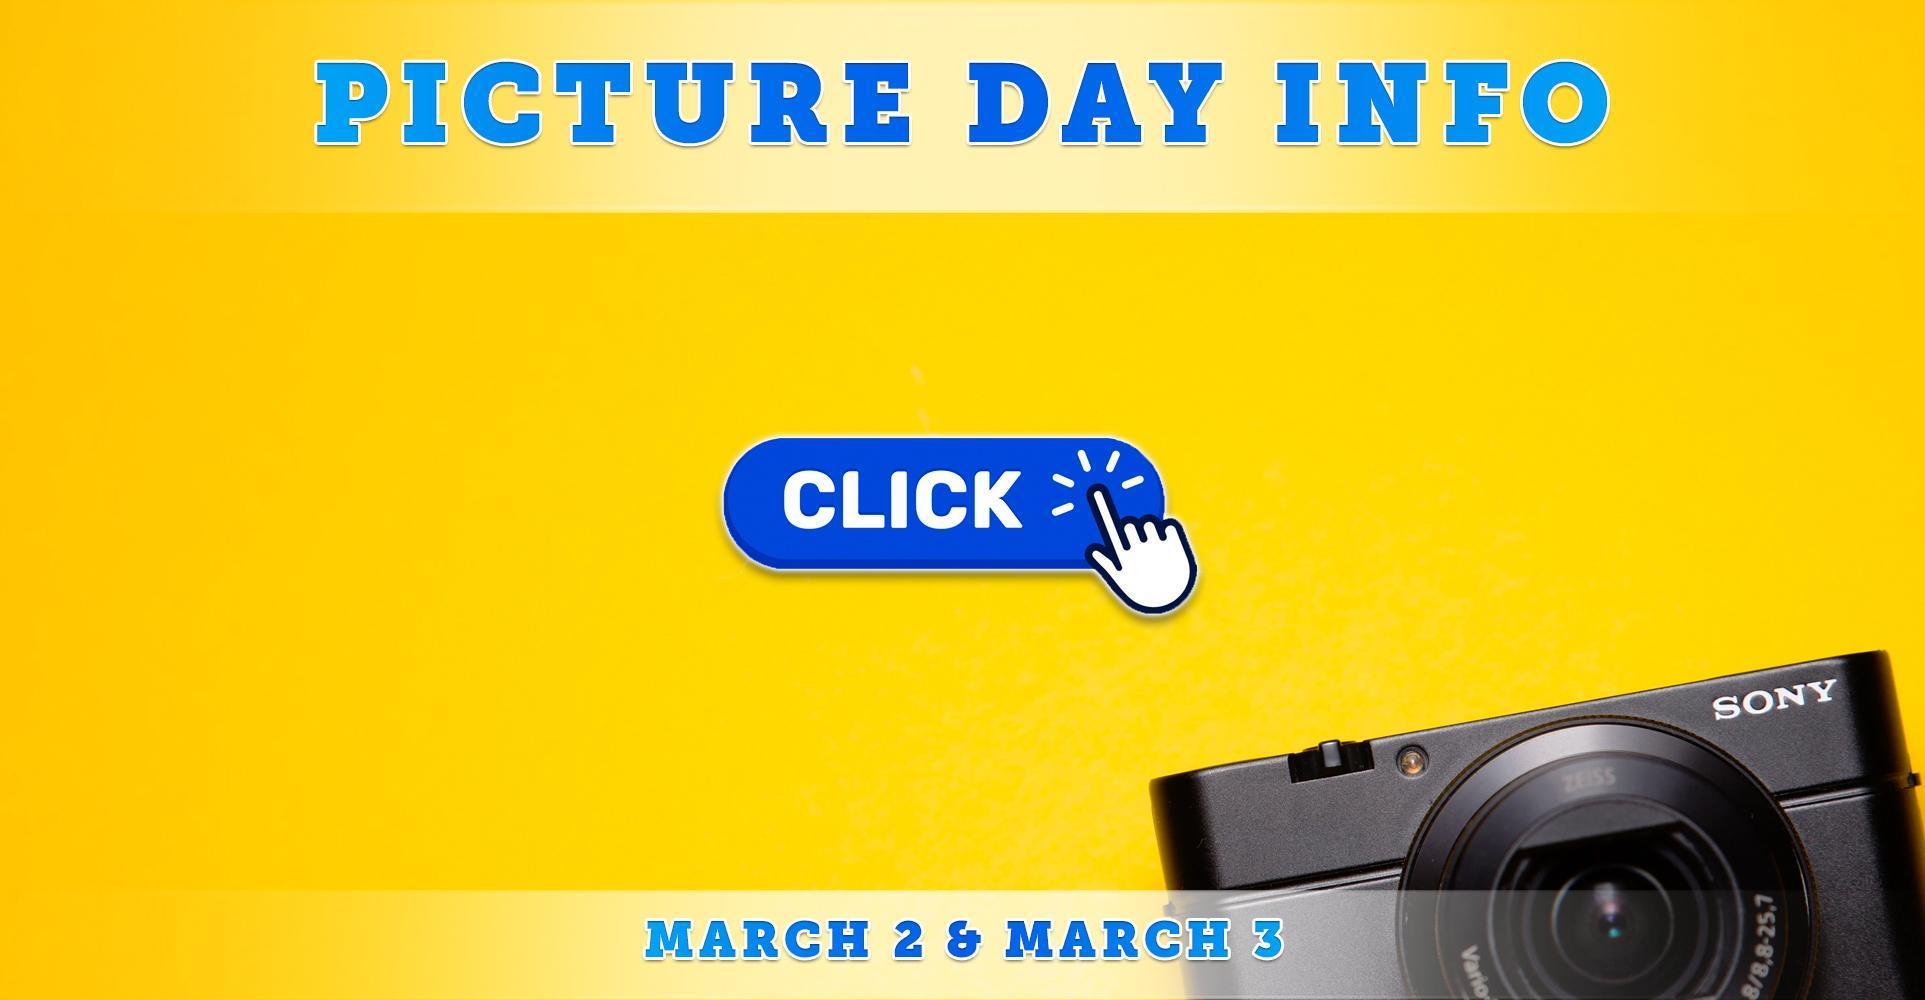 Linda Vista Picture Day Info   March 2 & 3